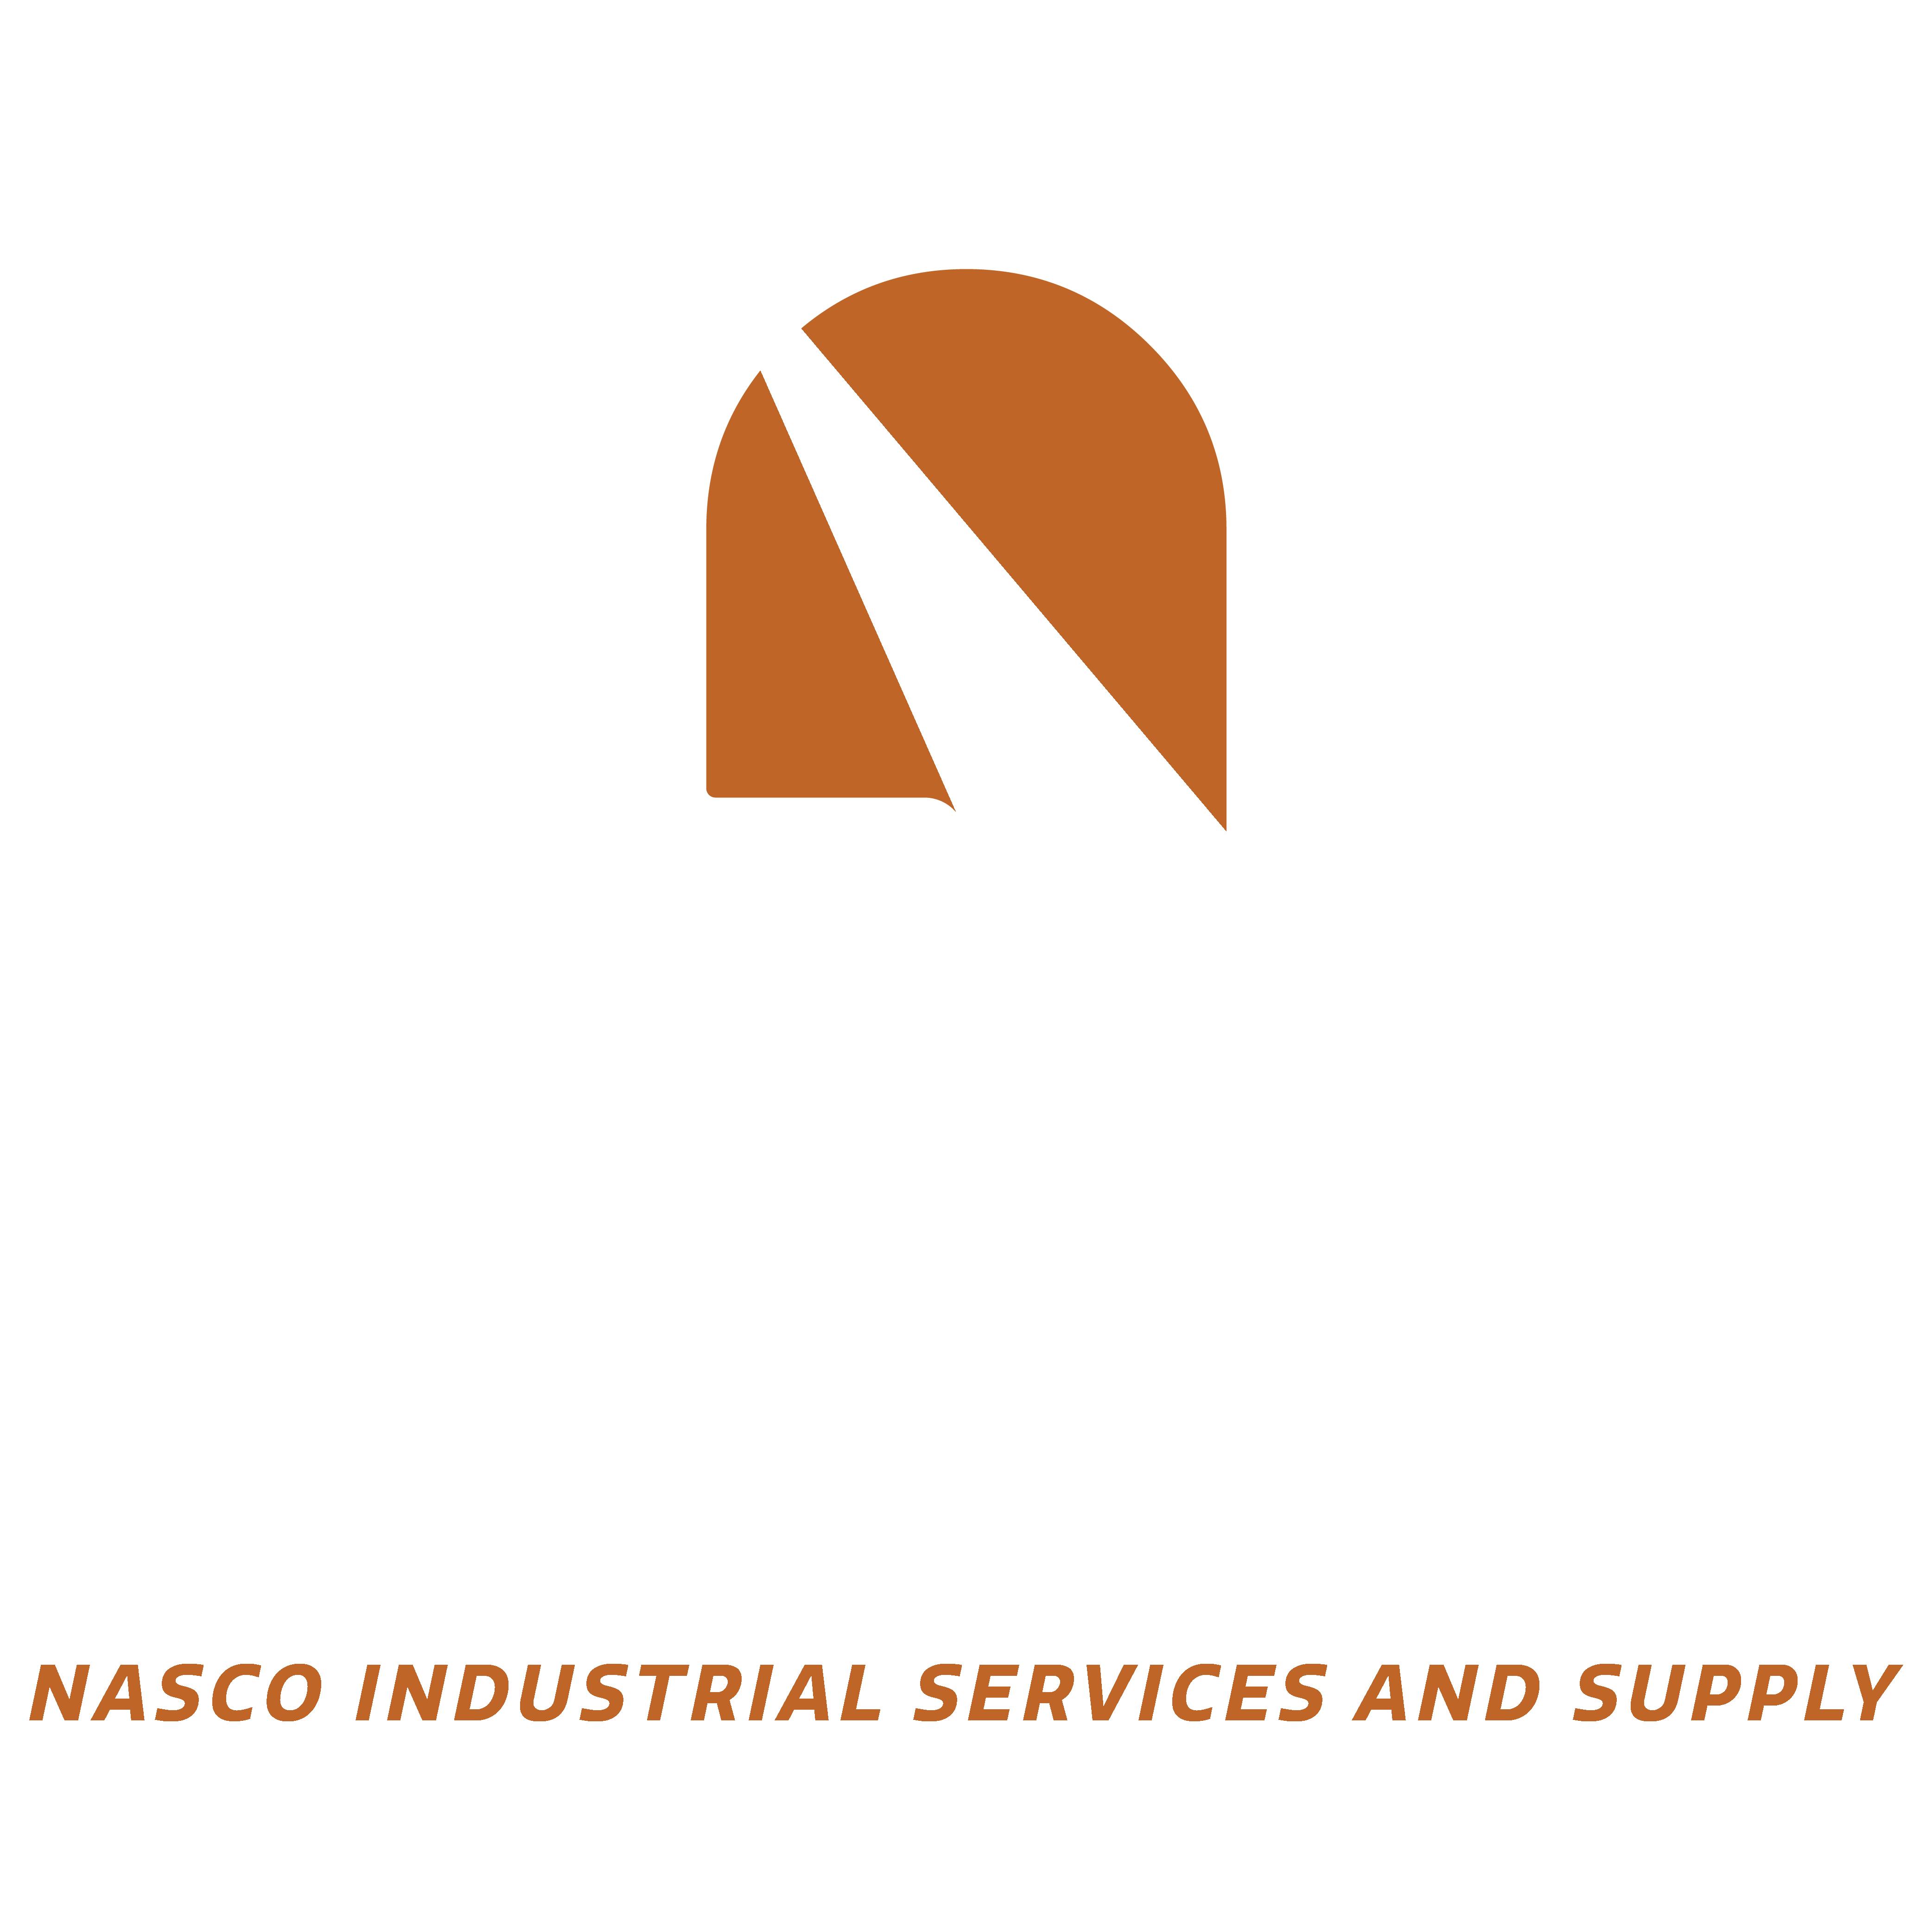 niss_logo_alternate-1_white-orange-title